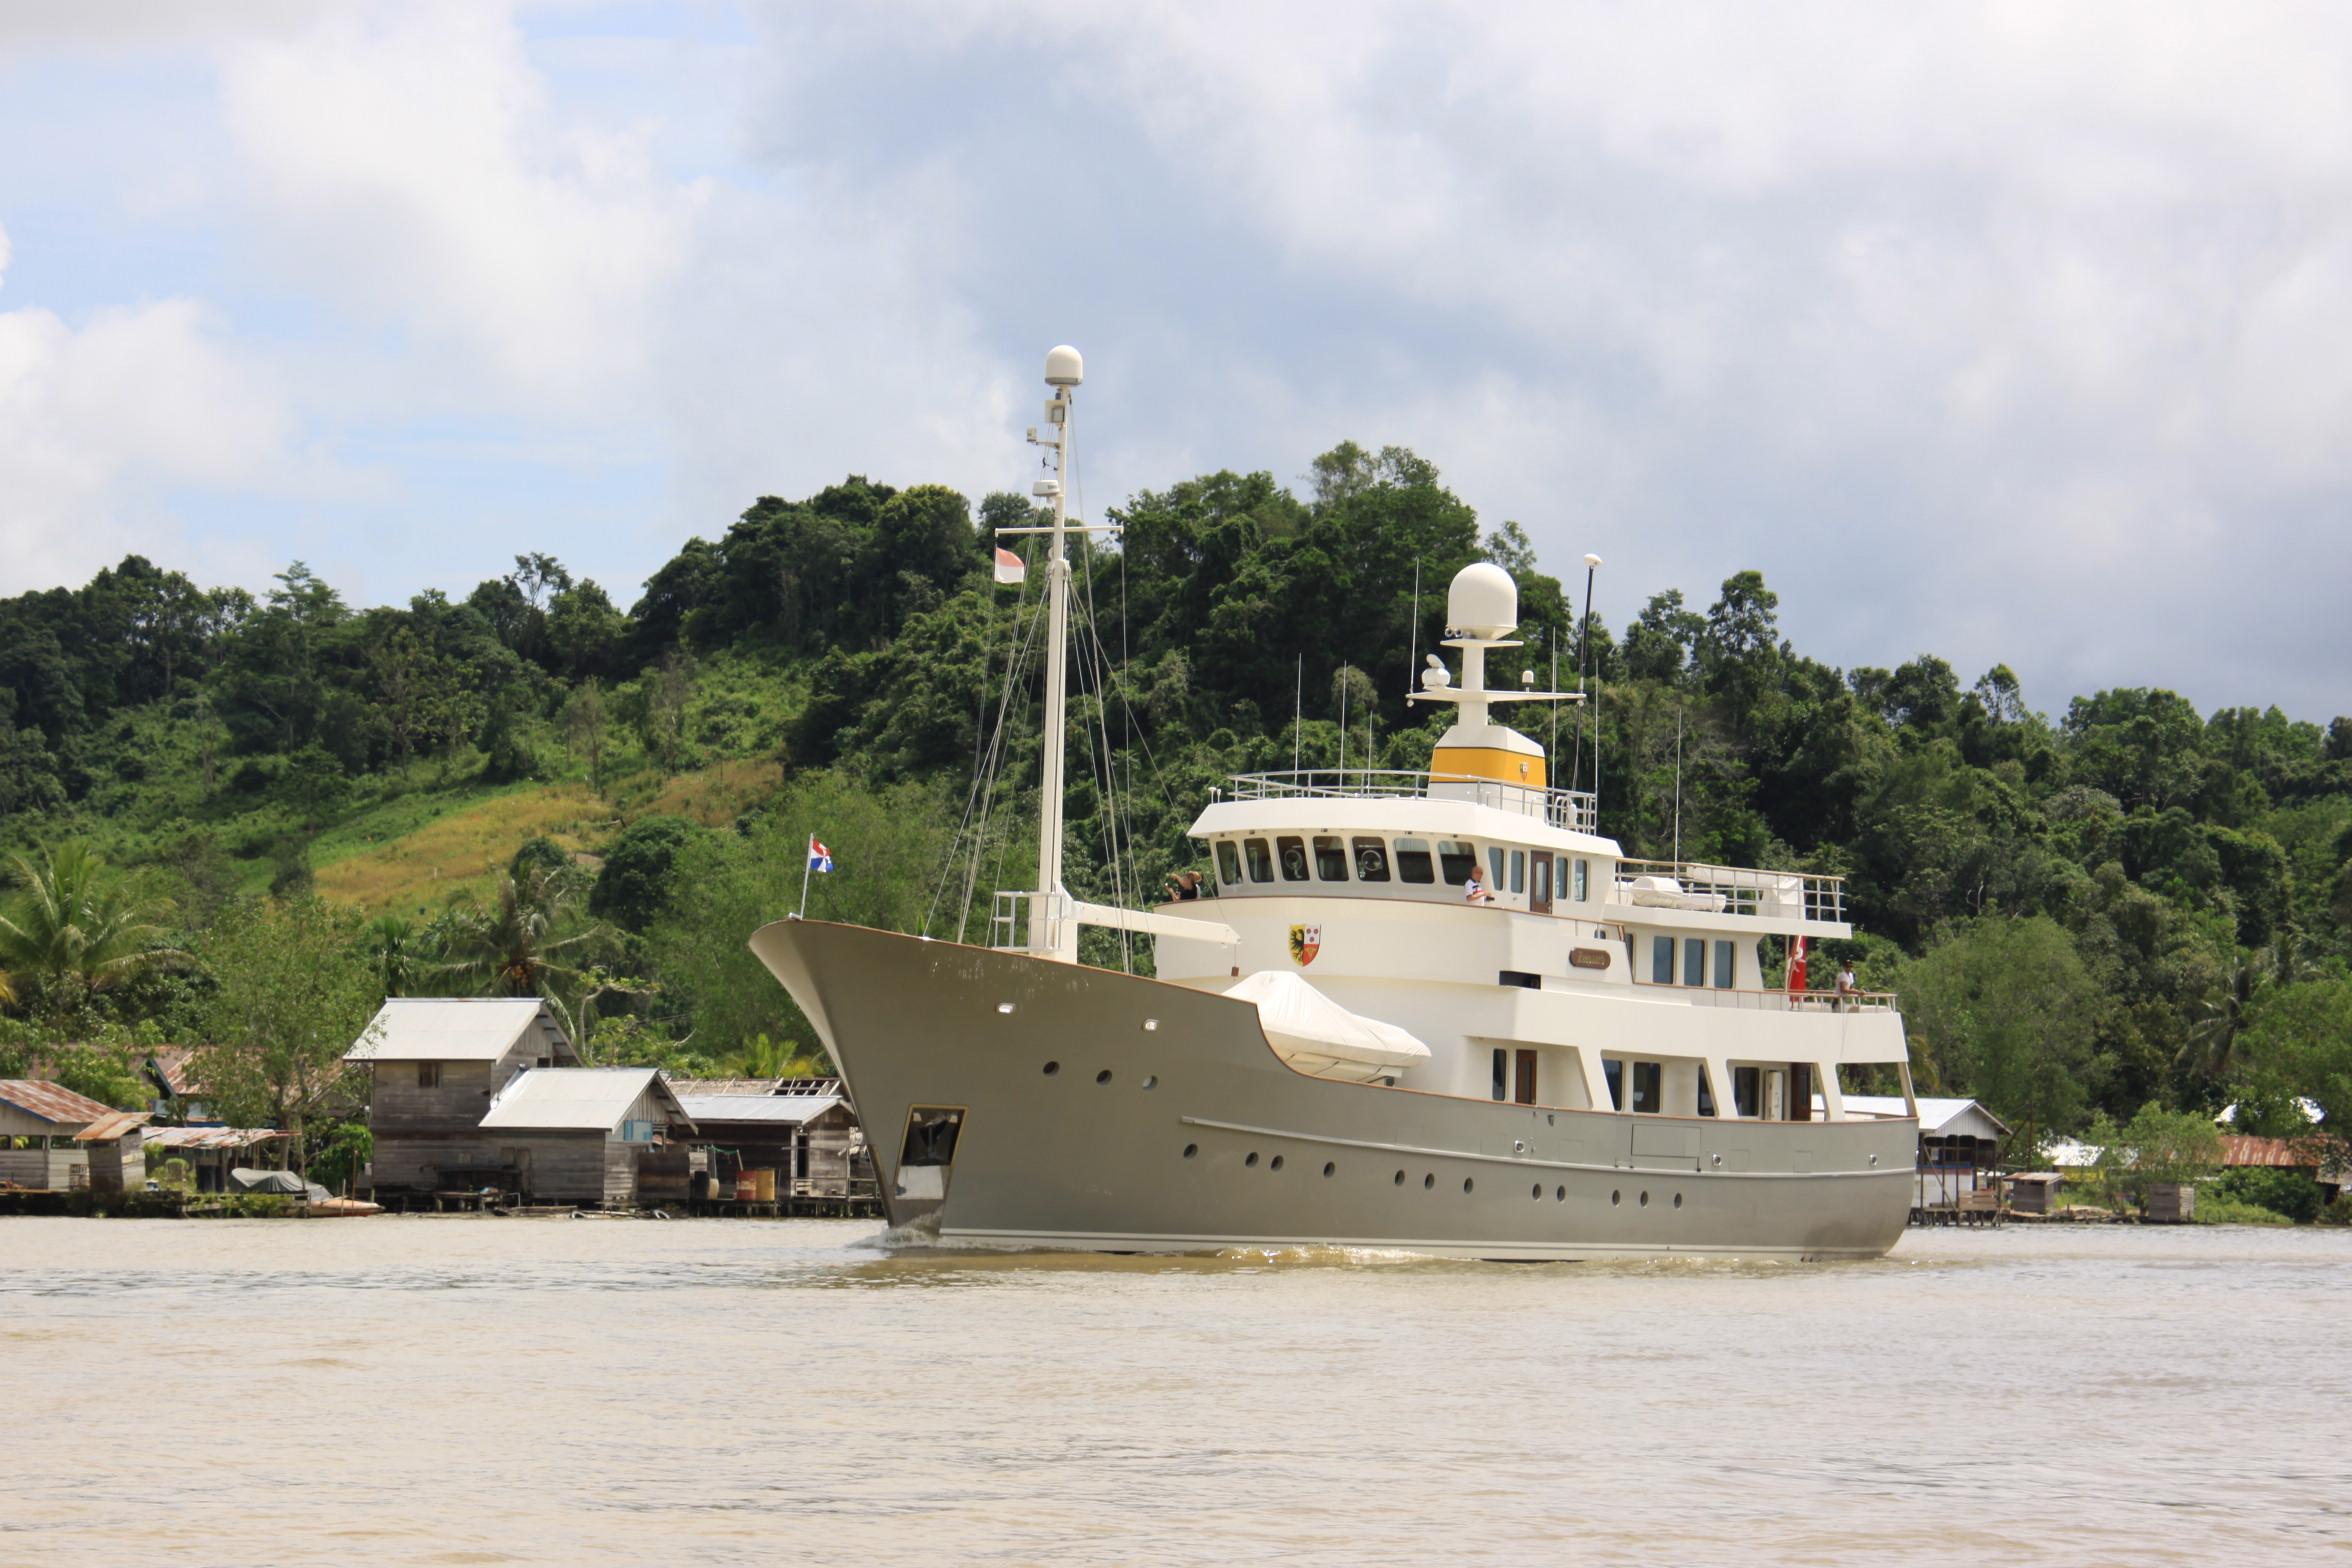 Luxury superyacht keyla interior by hot lab luxury yacht charter - Zeepaard Yacht Ex Axantha I In Borneo Indonesia Copyrights Zeepaard